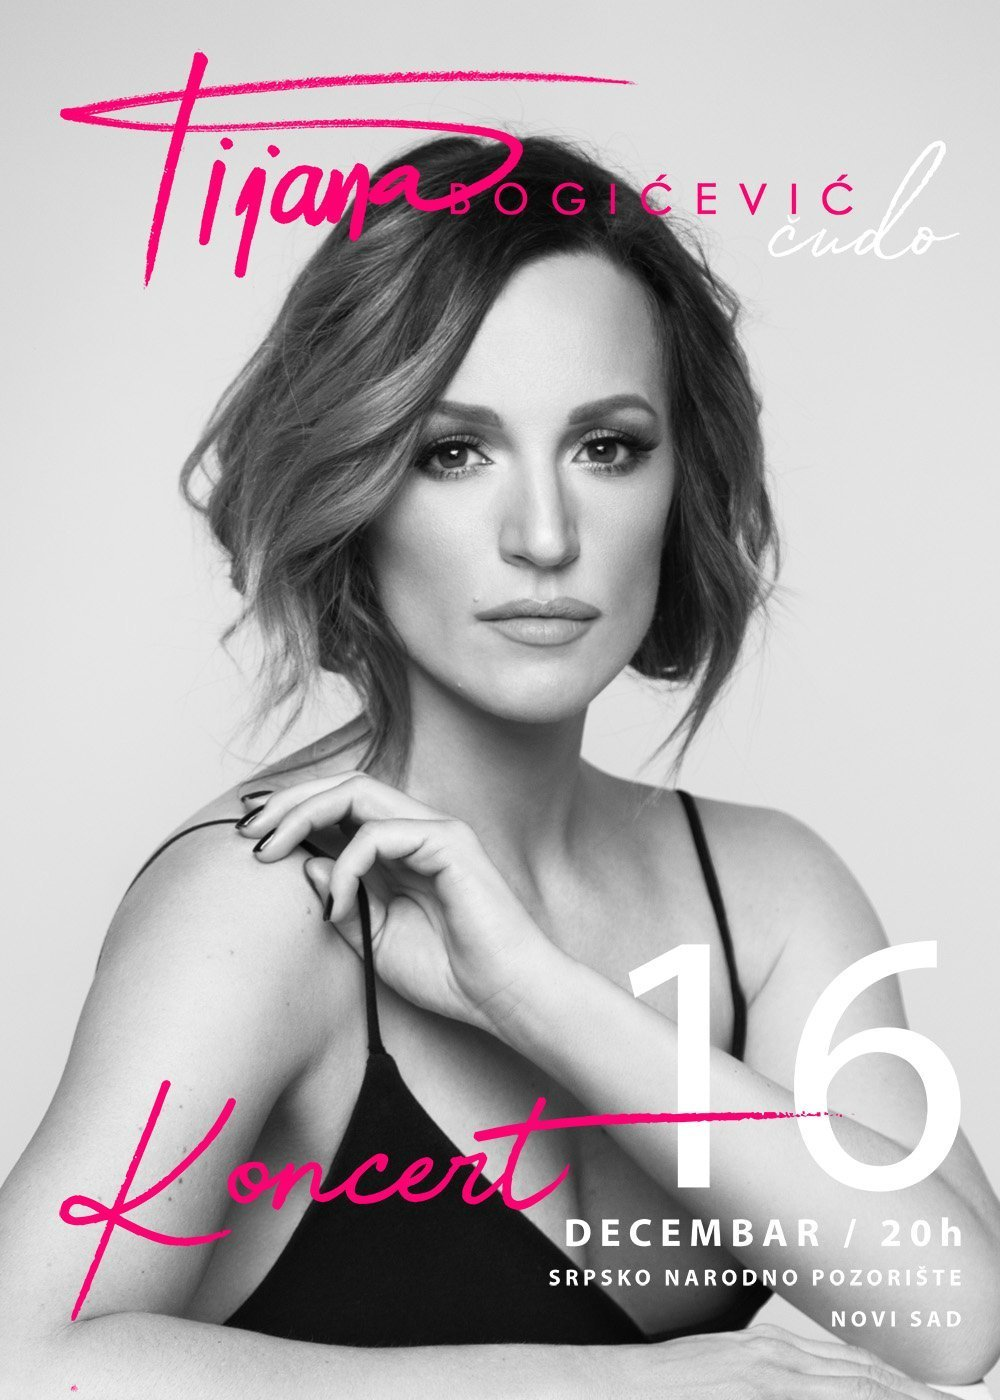 Tijana Bogicevic Poster Kocert 3